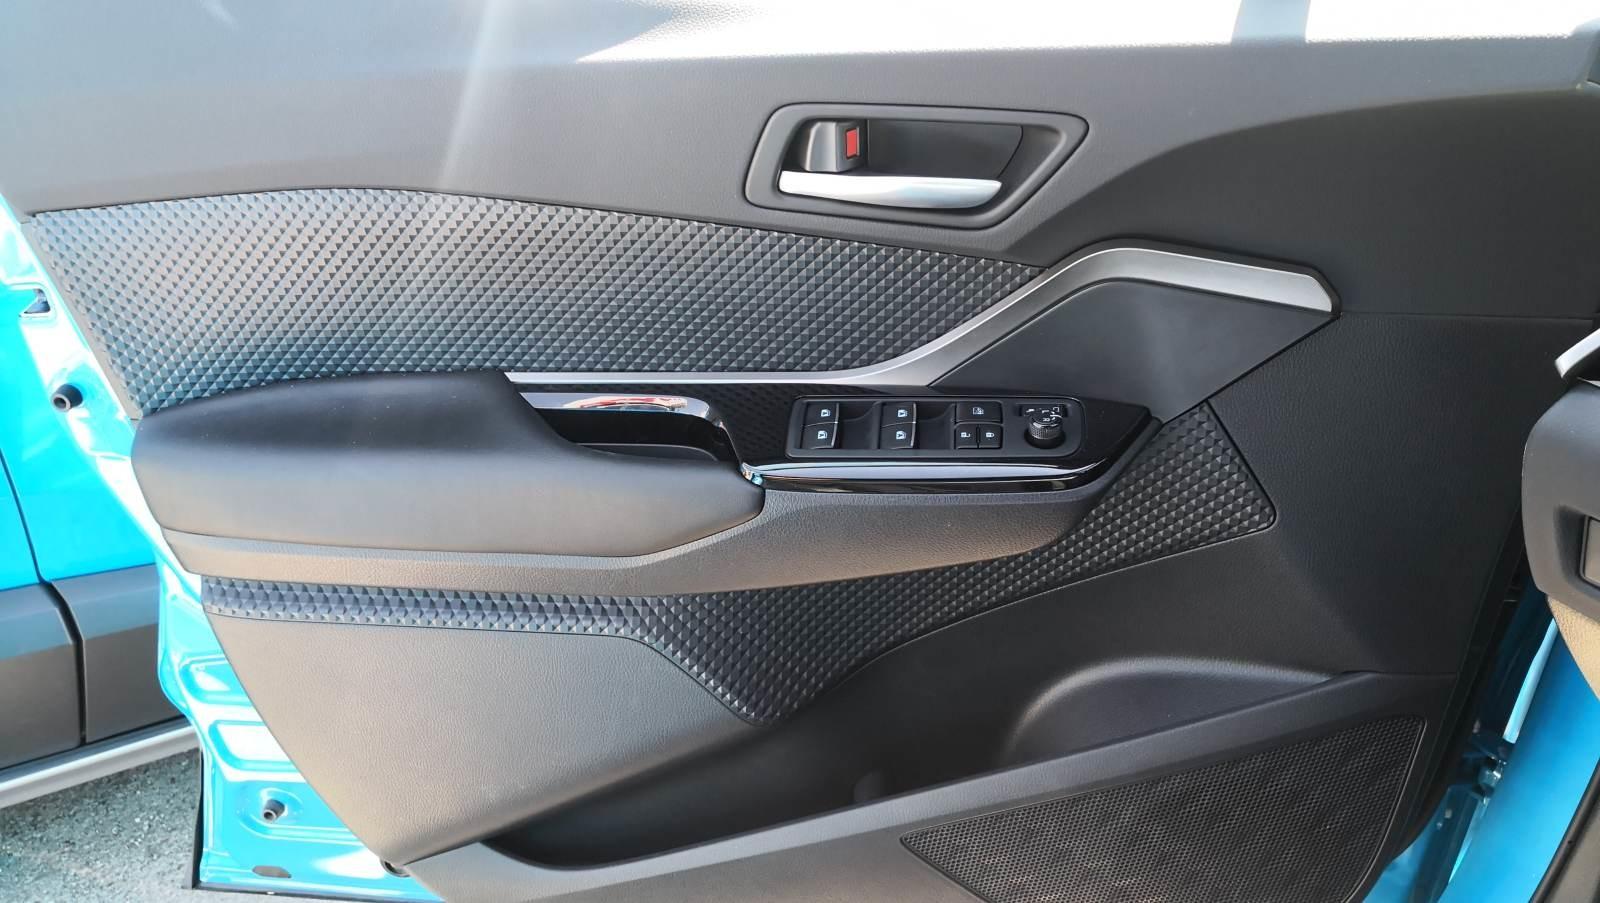 Foto de Toyota C-HR Dynamic Plus - Fotos interiores y detalles (8/15)